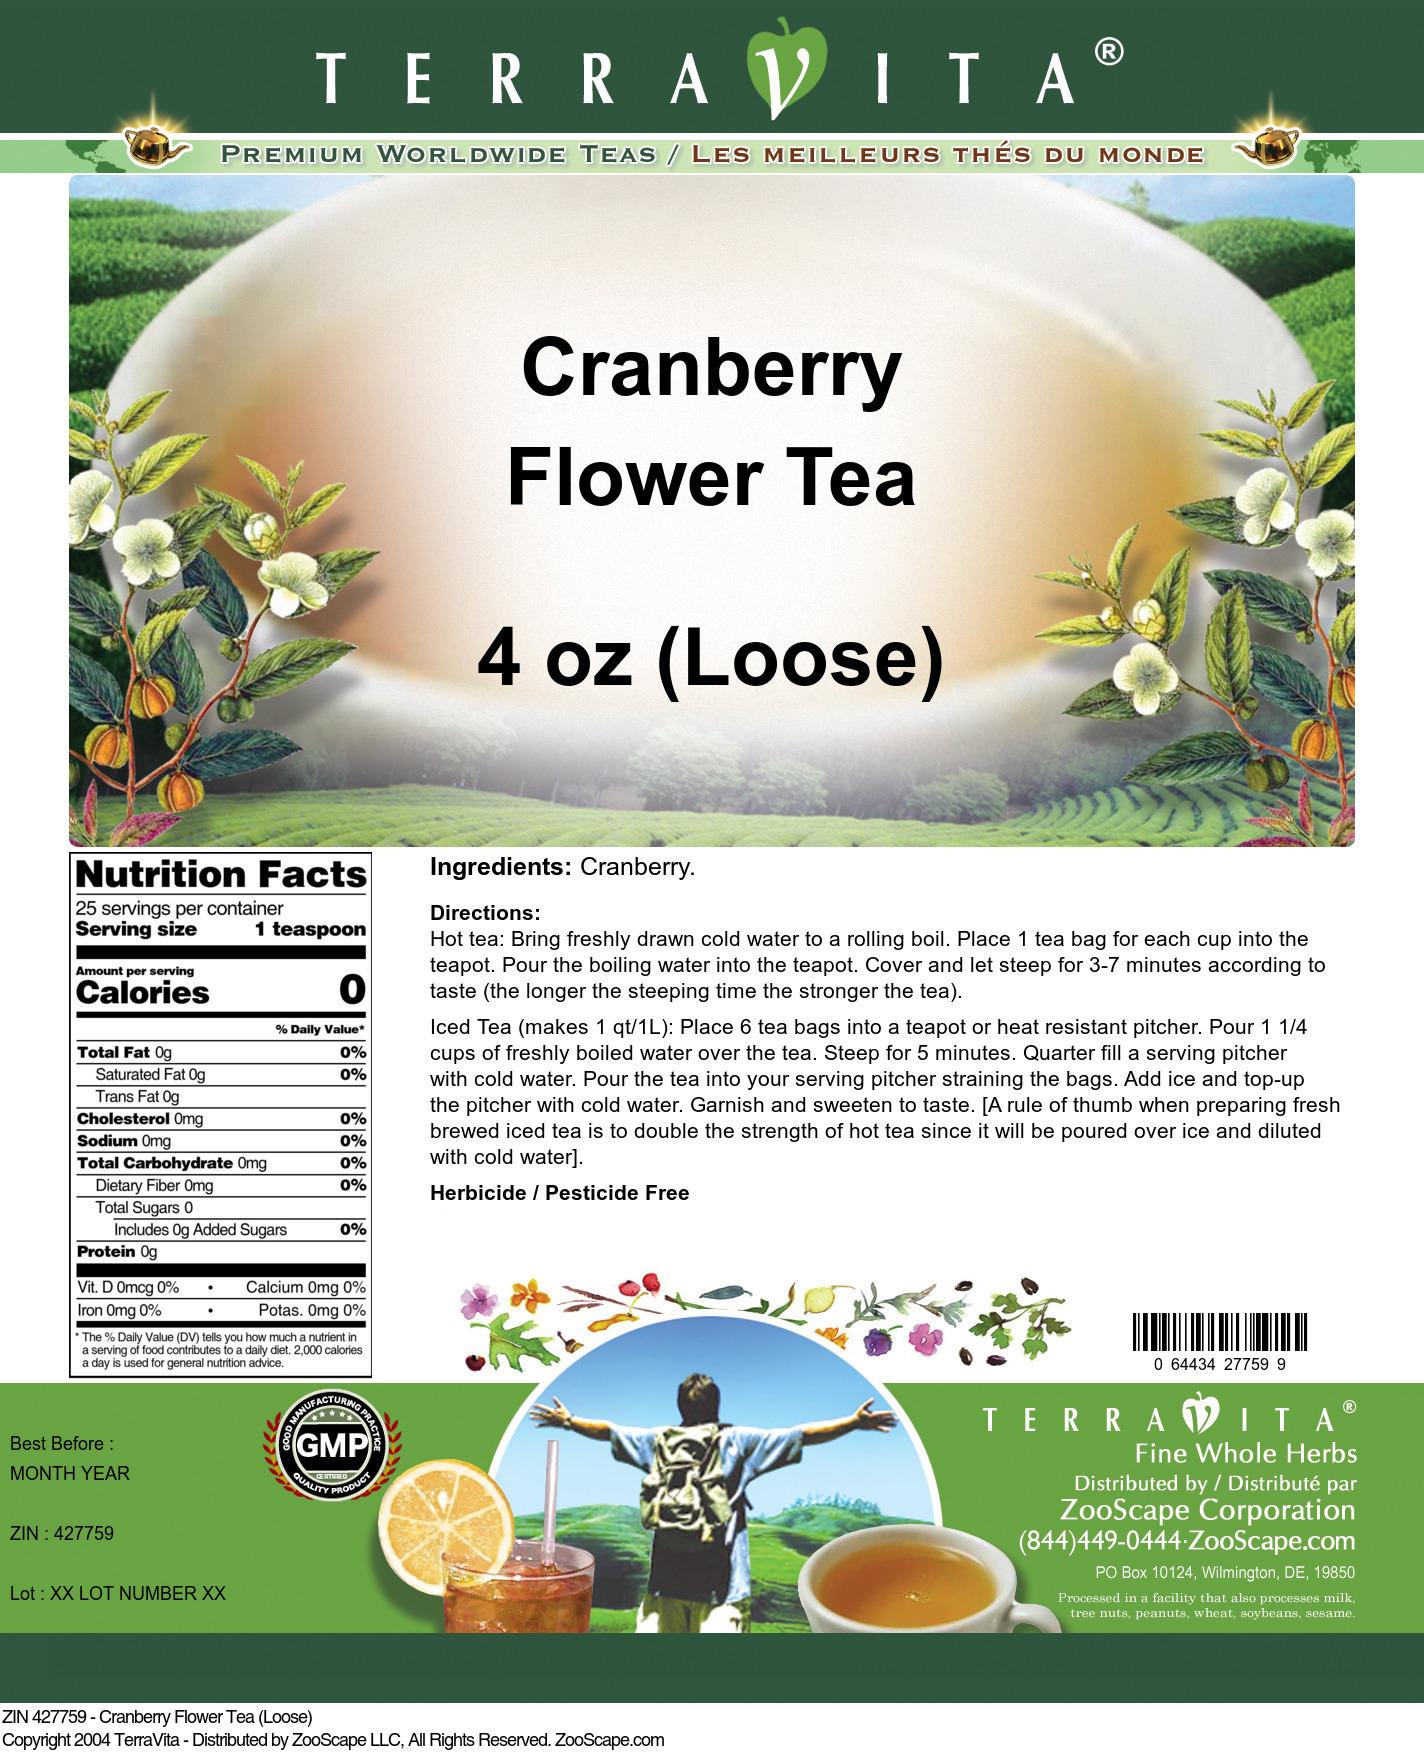 Cranberry Flower Tea (Loose)